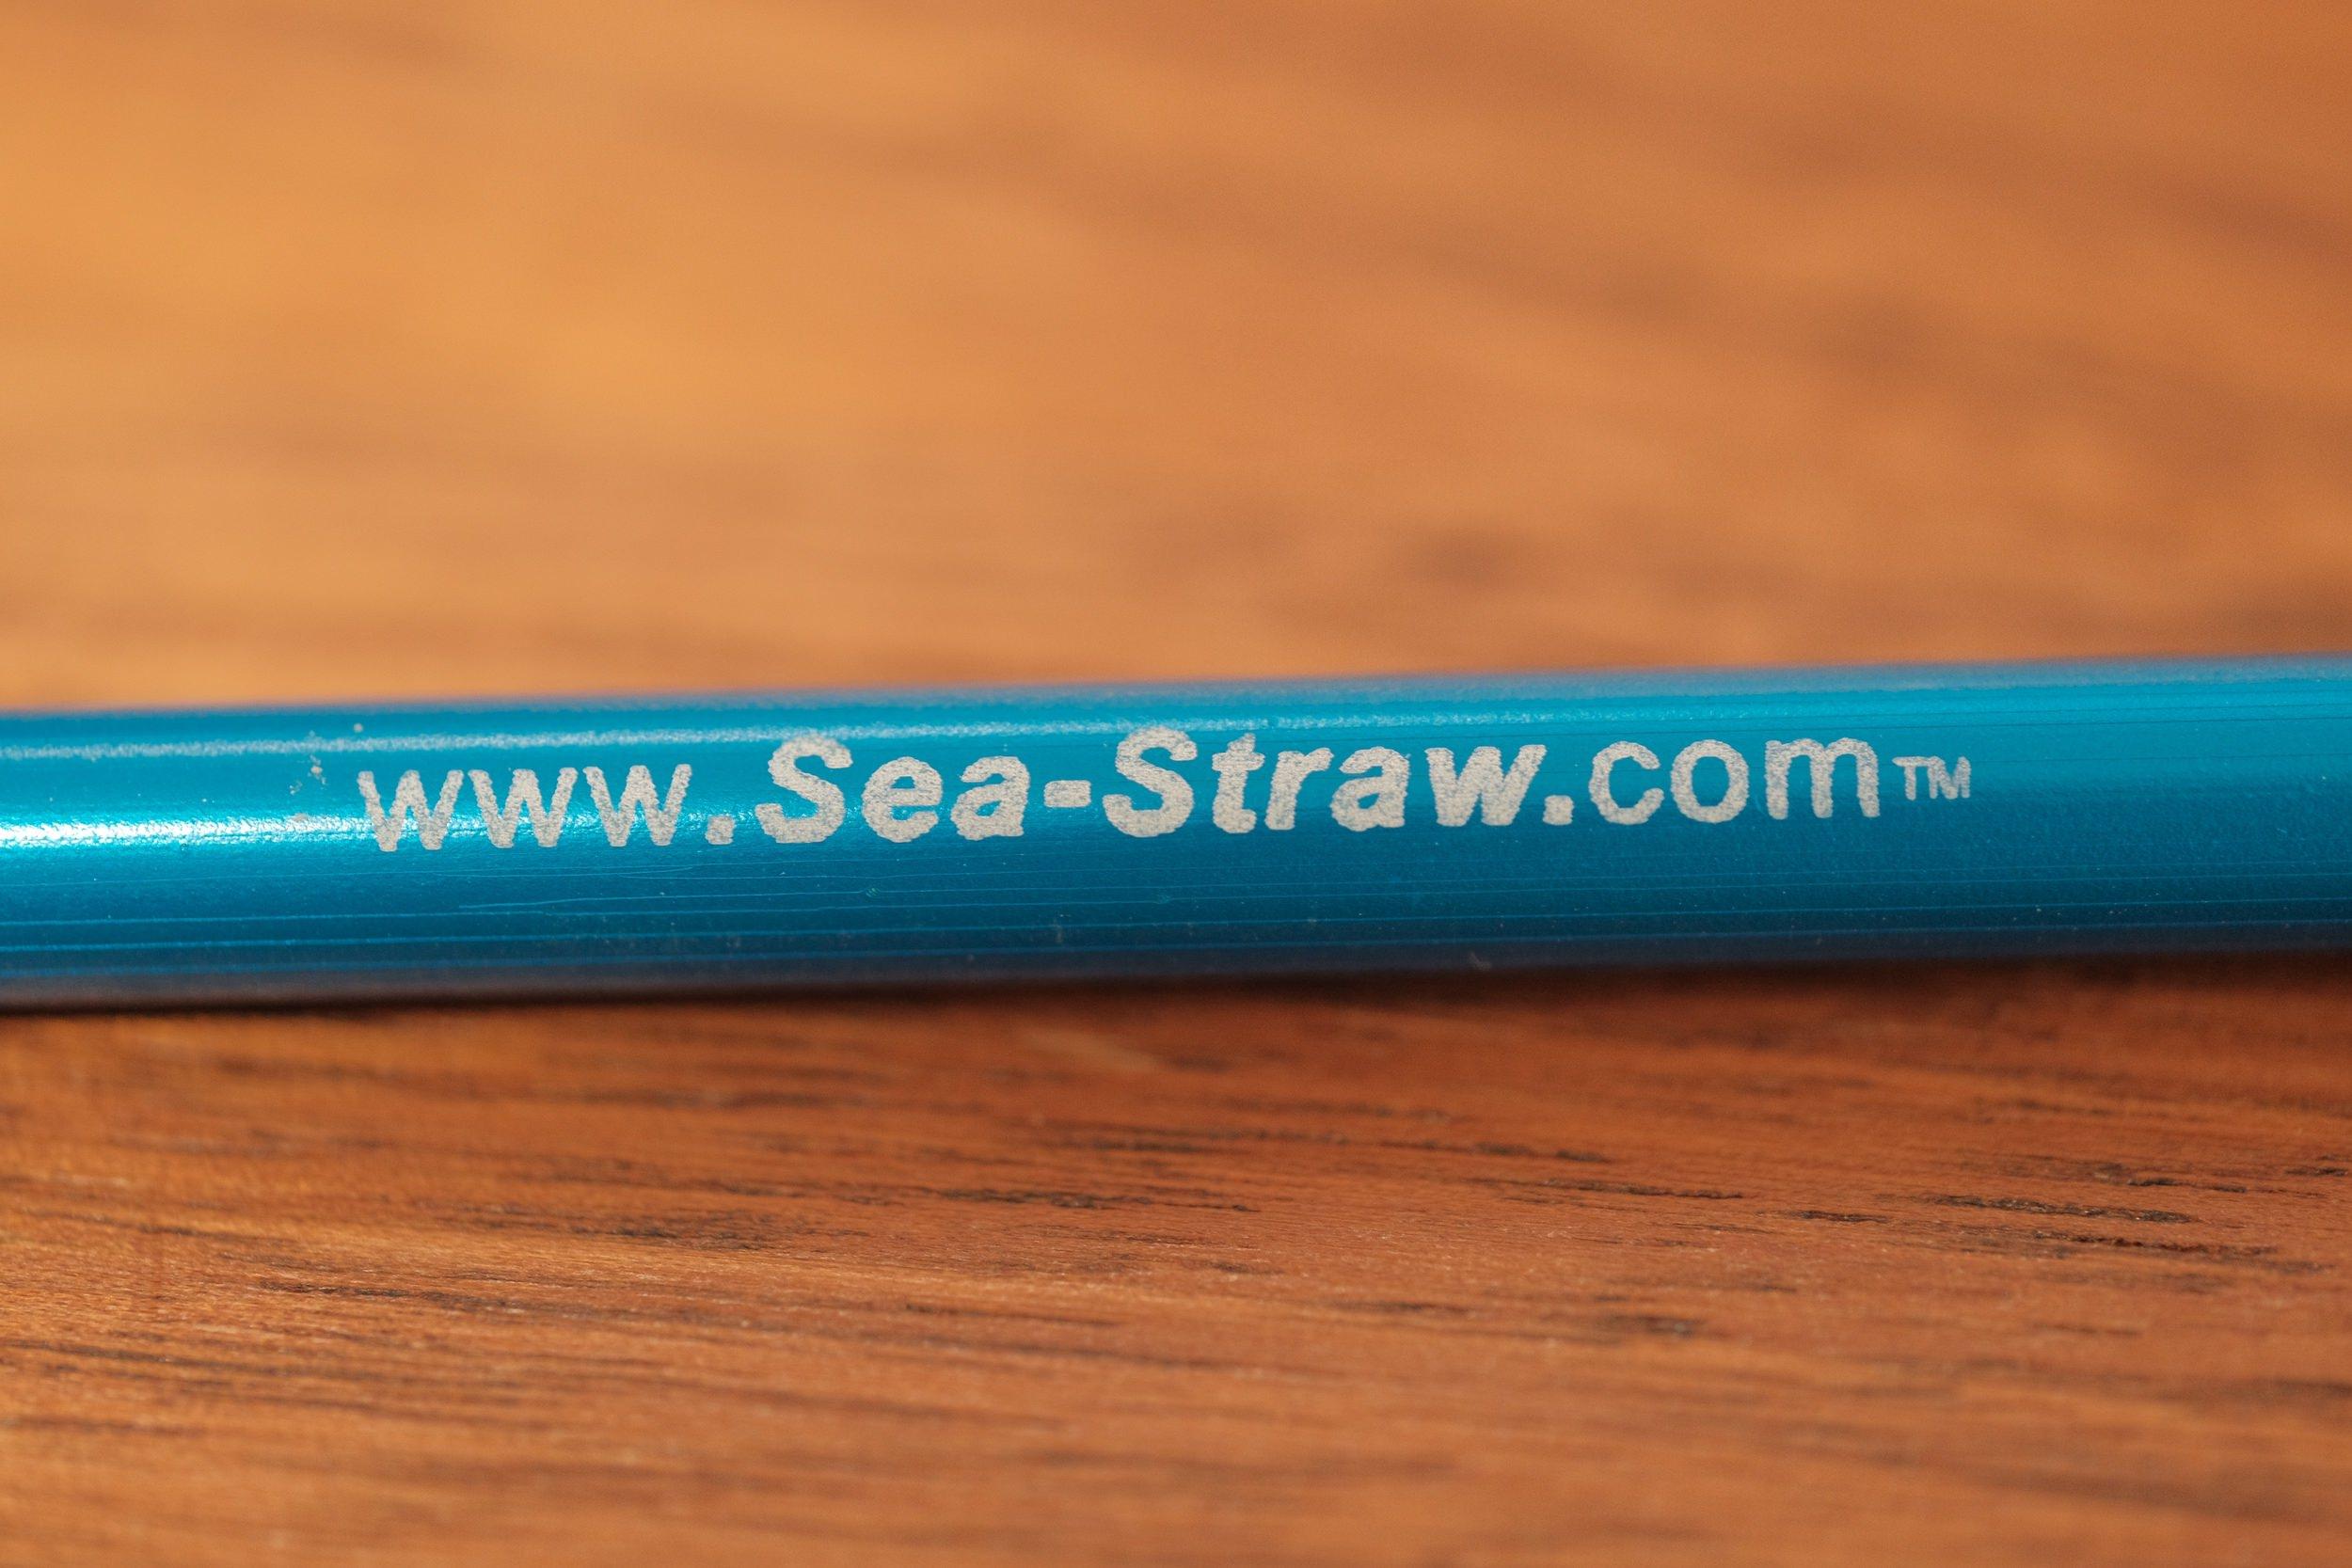 Sea-Straw Aluminum Straws with etching 02.JPG